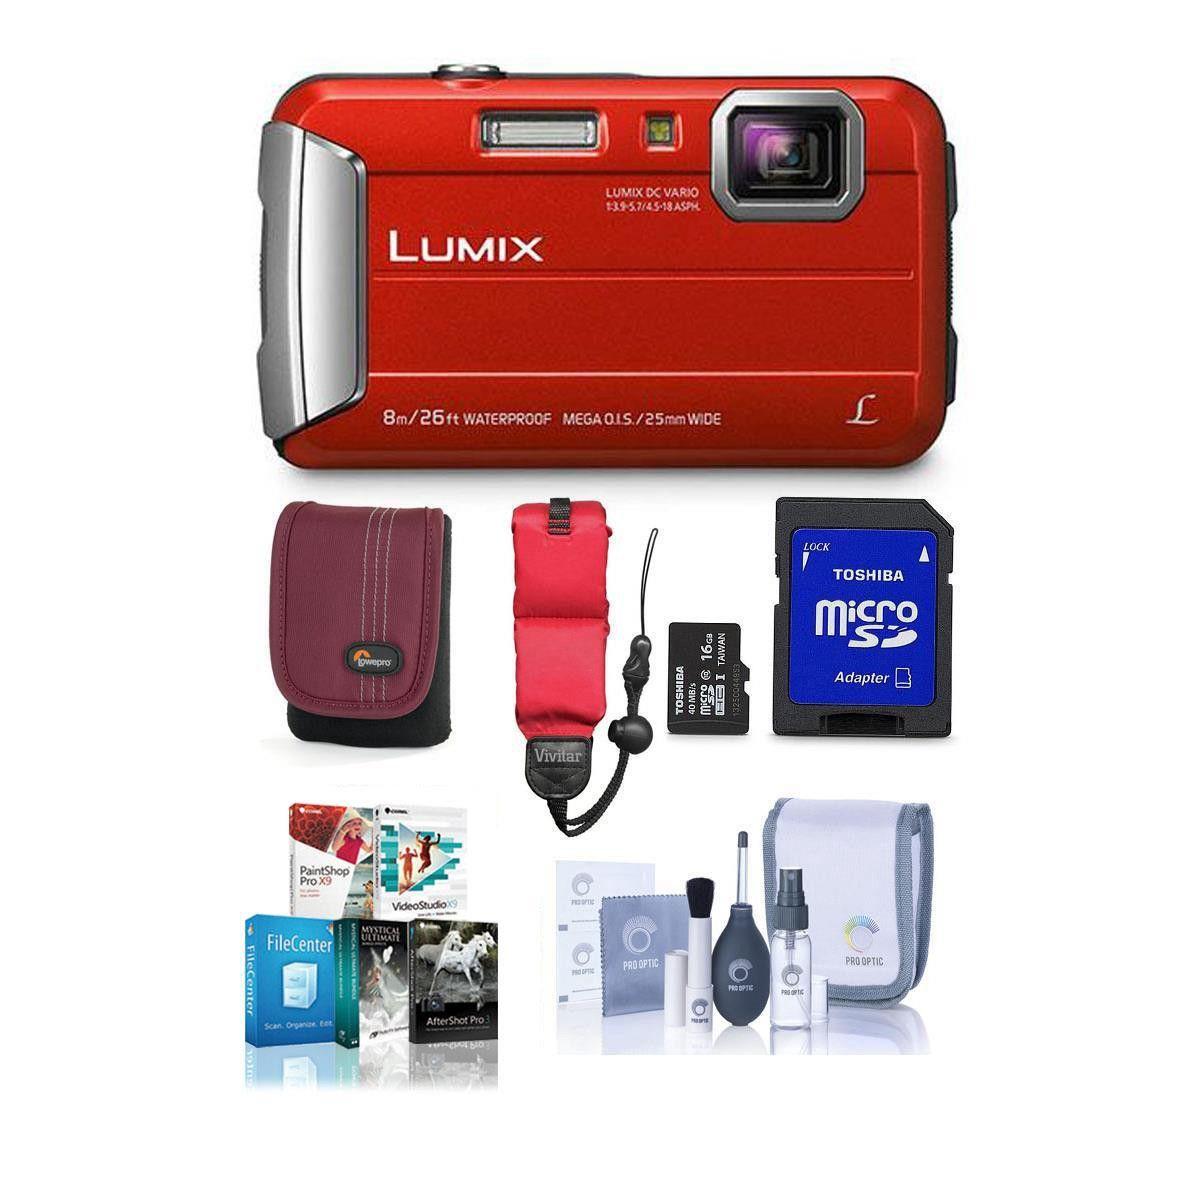 Panasonic Lumix DMC-TS30 Digital Camera with Free